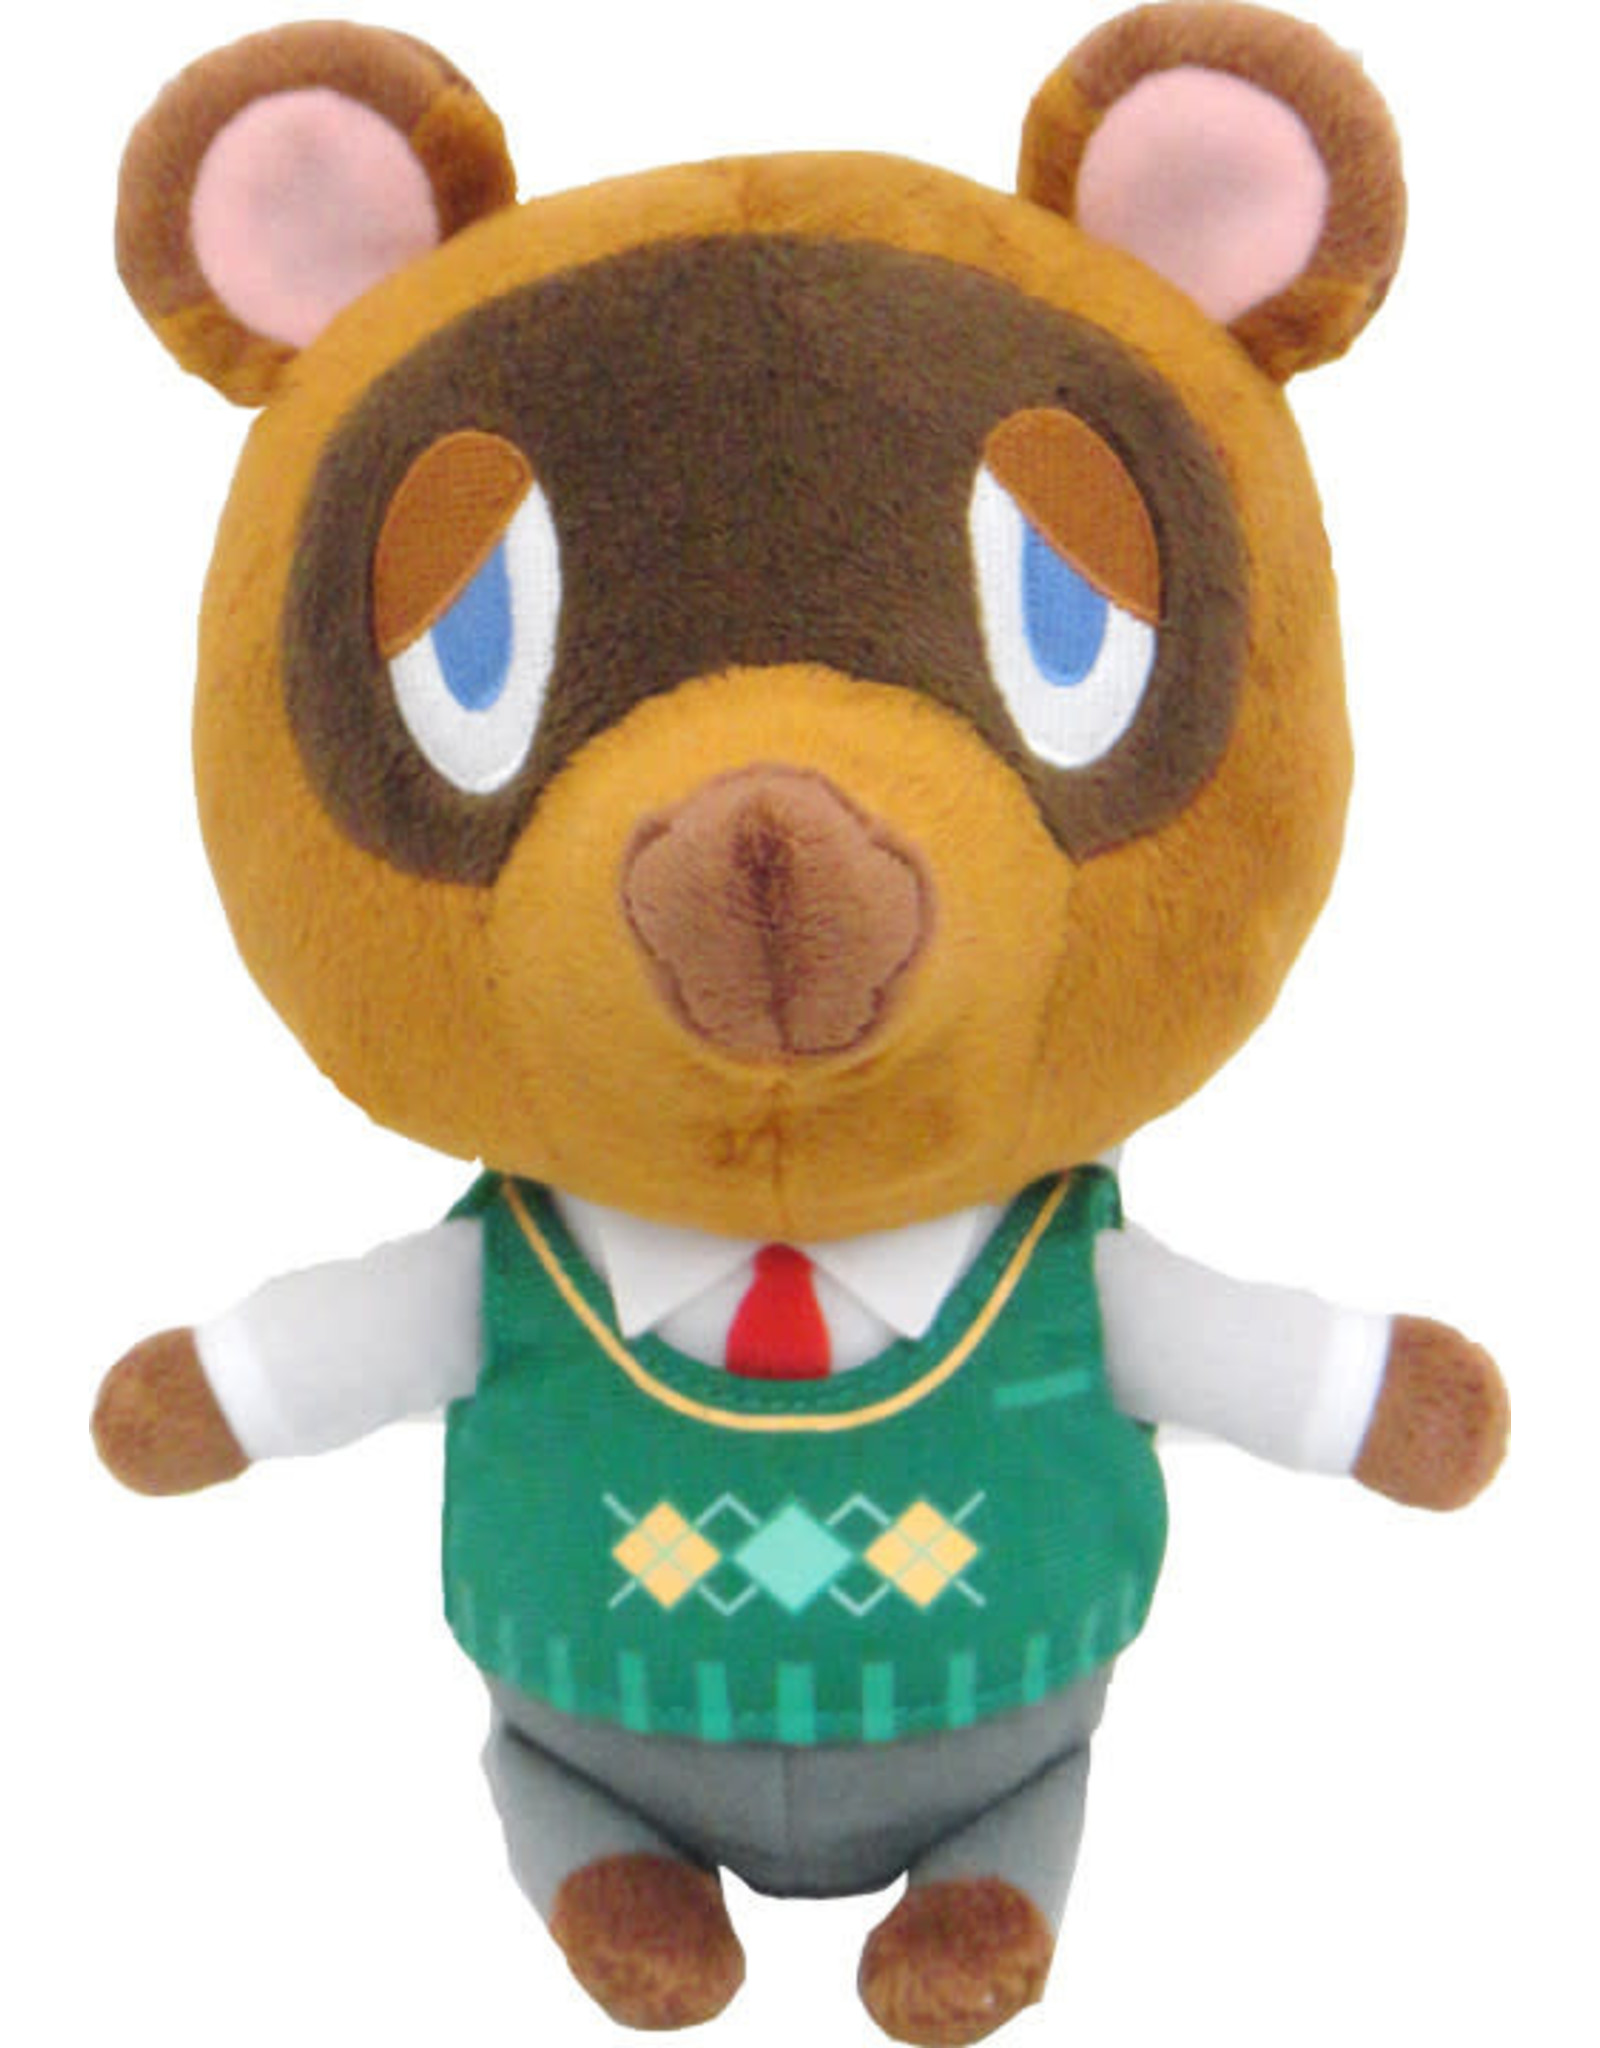 Animal Crossing Plushie - Tom Nook - 18cm